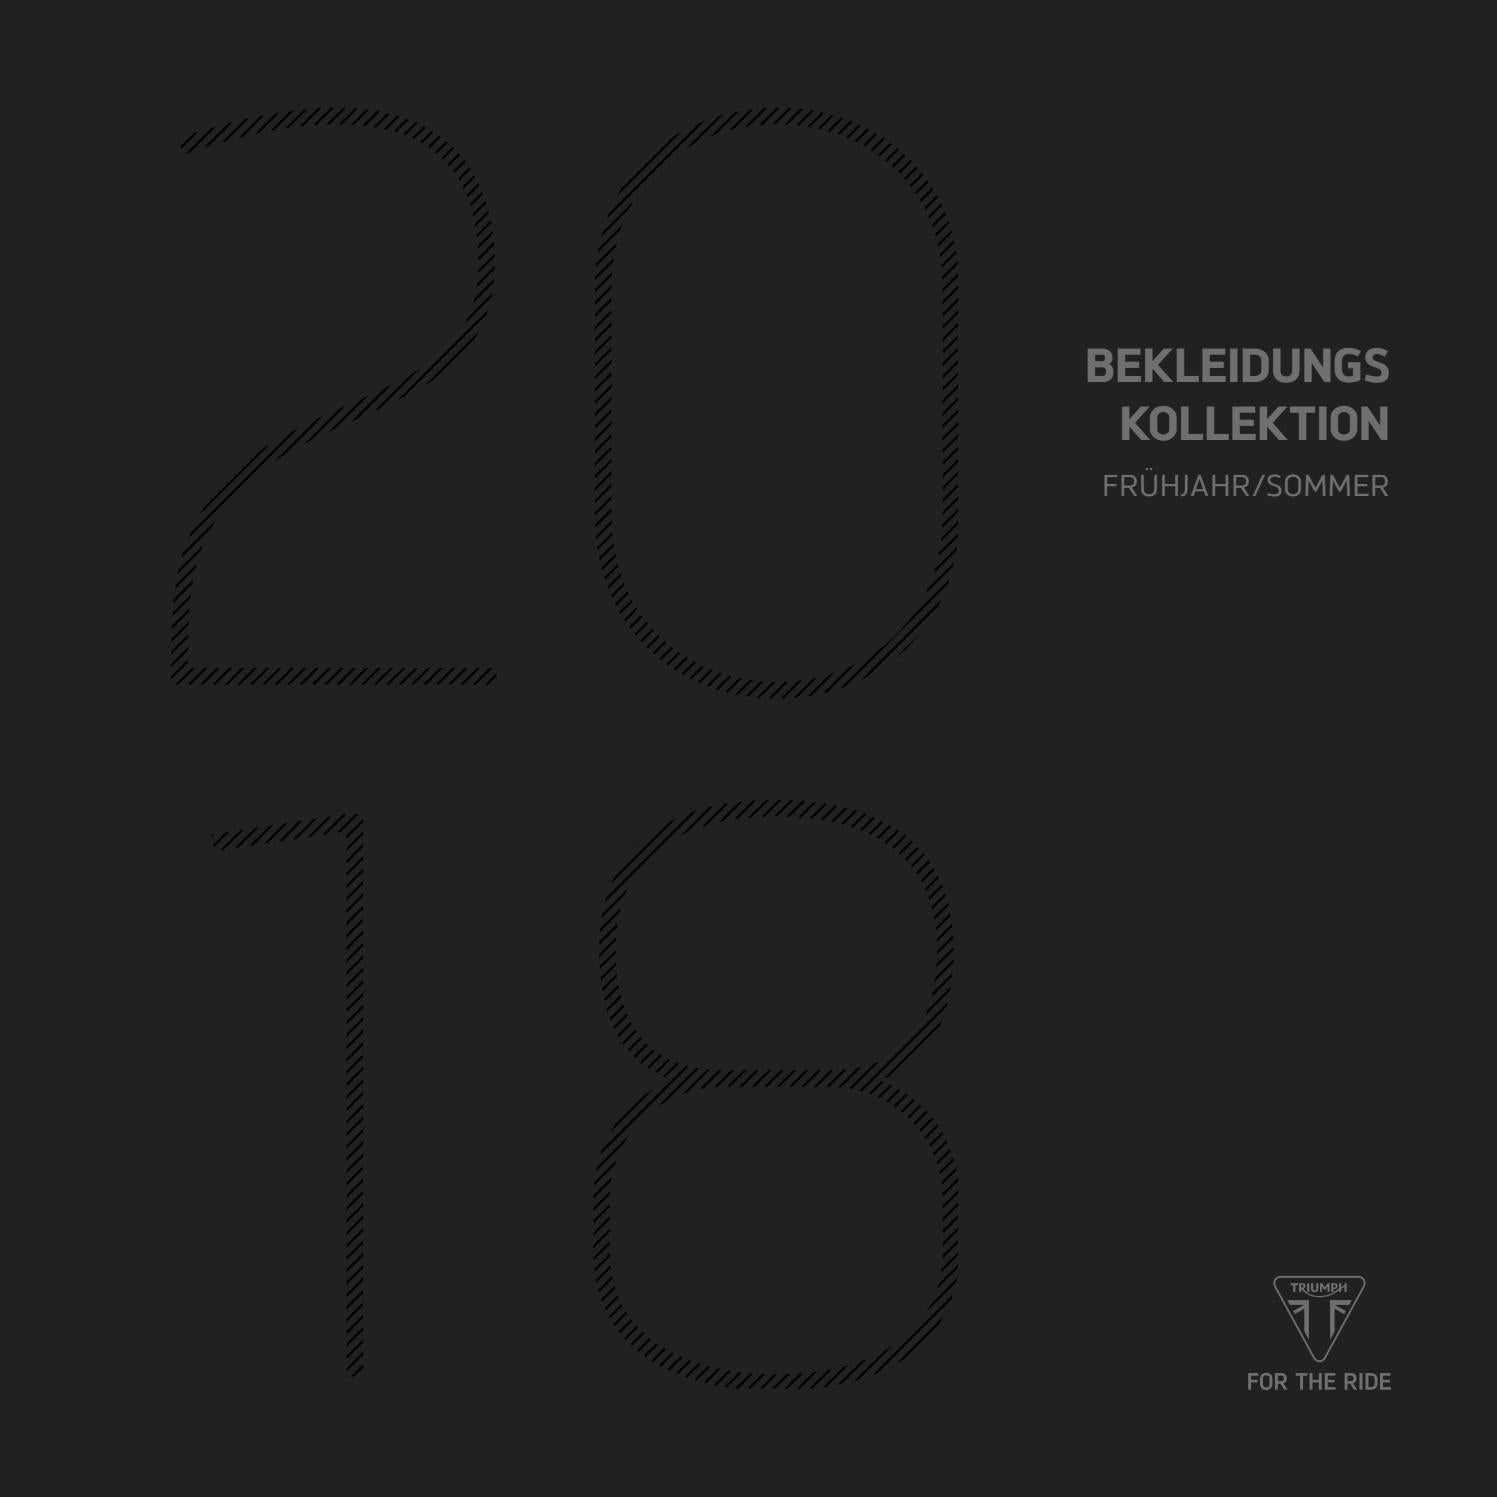 Triumph 1000ps Bekleidung Issuu By Gmbh Internet 2018 txrCdshQ